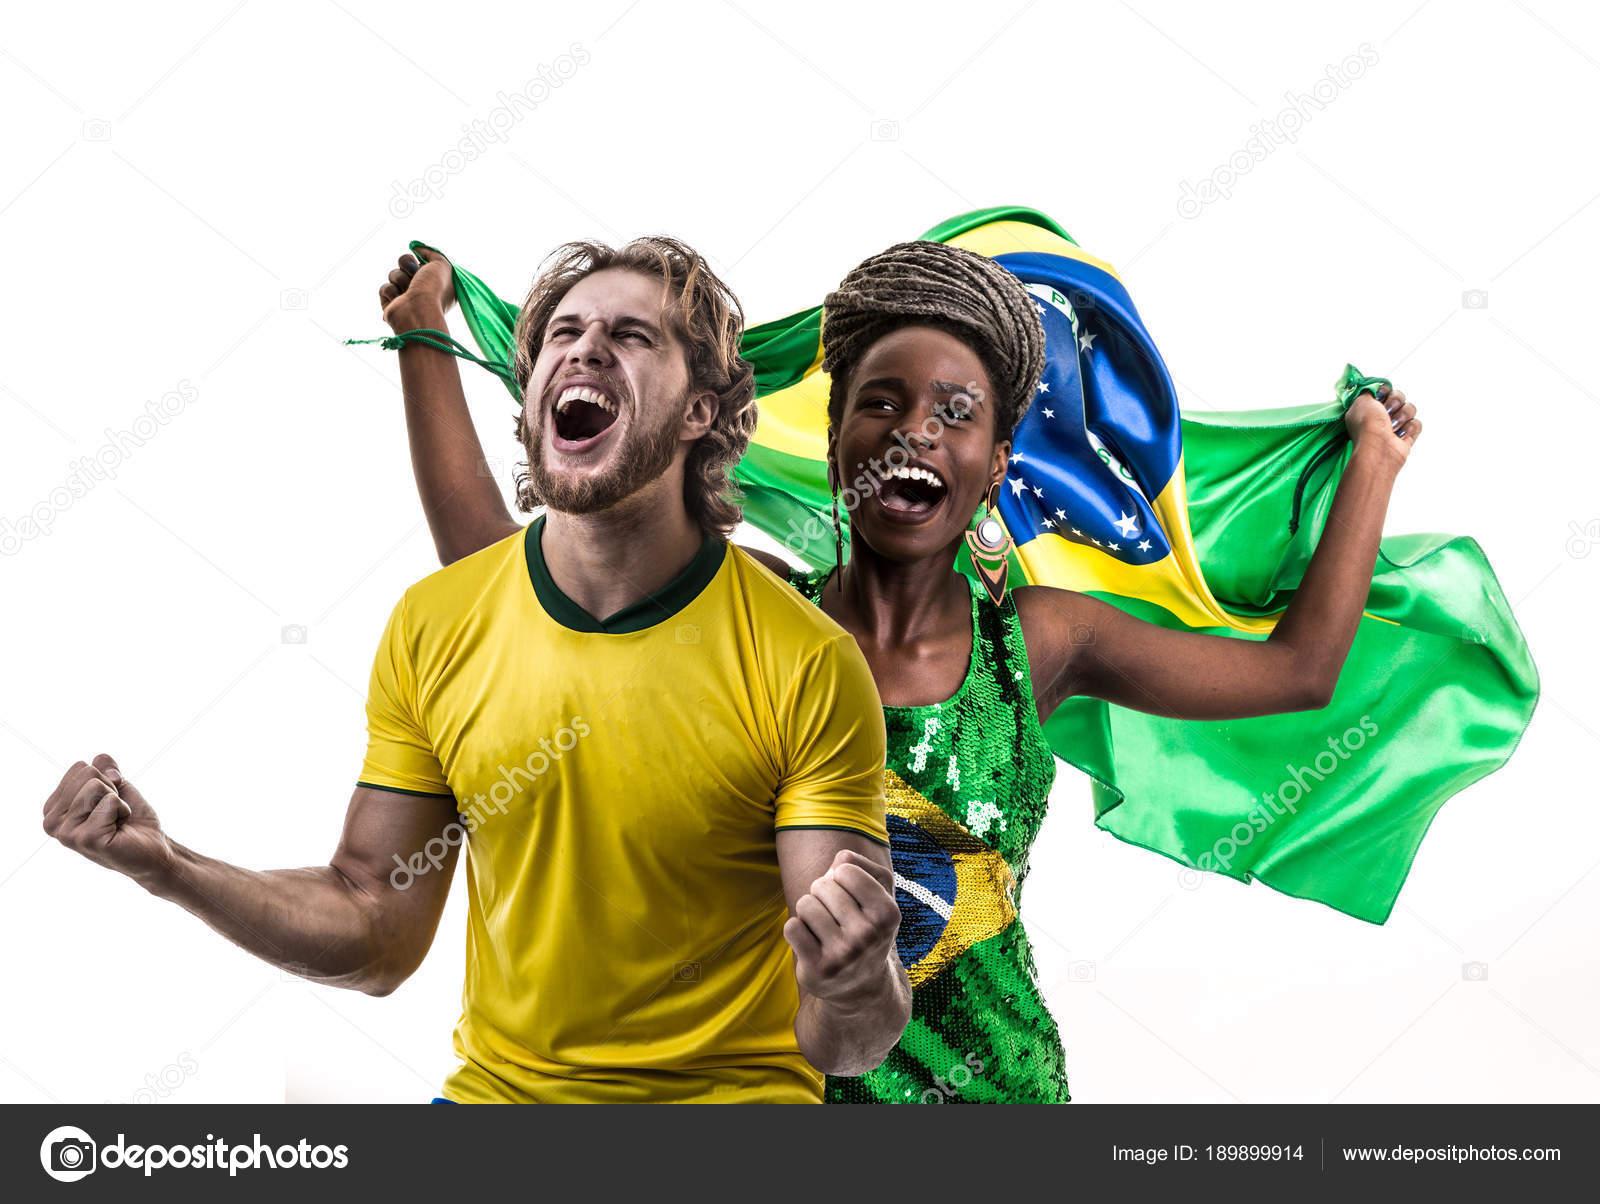 Guapo Hombre Caucásico Camiseta Amarilla Mujer Africana Con